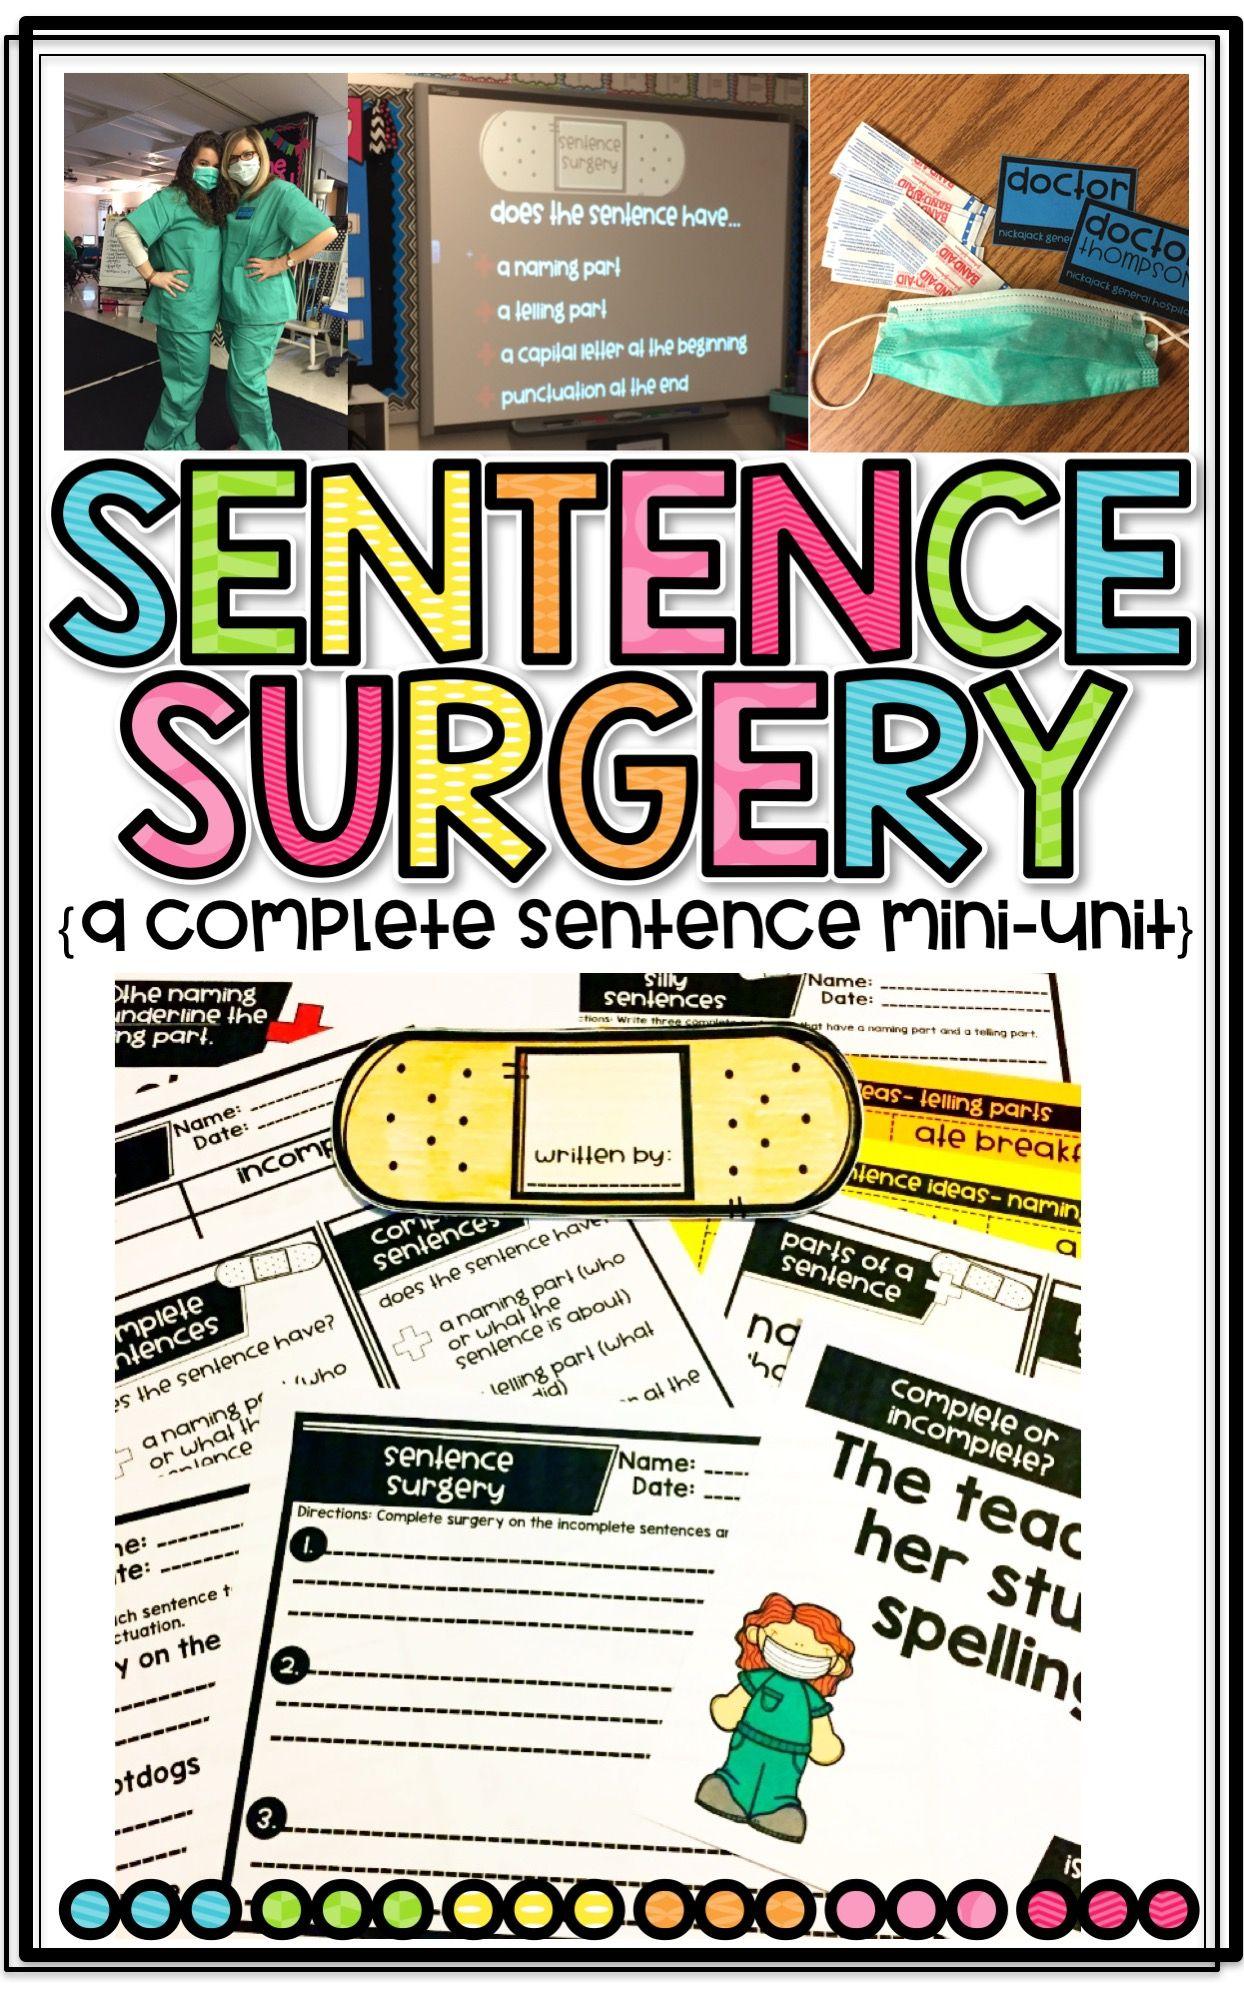 Sentence Surgery A Complete Sentence Writing Mini Unit